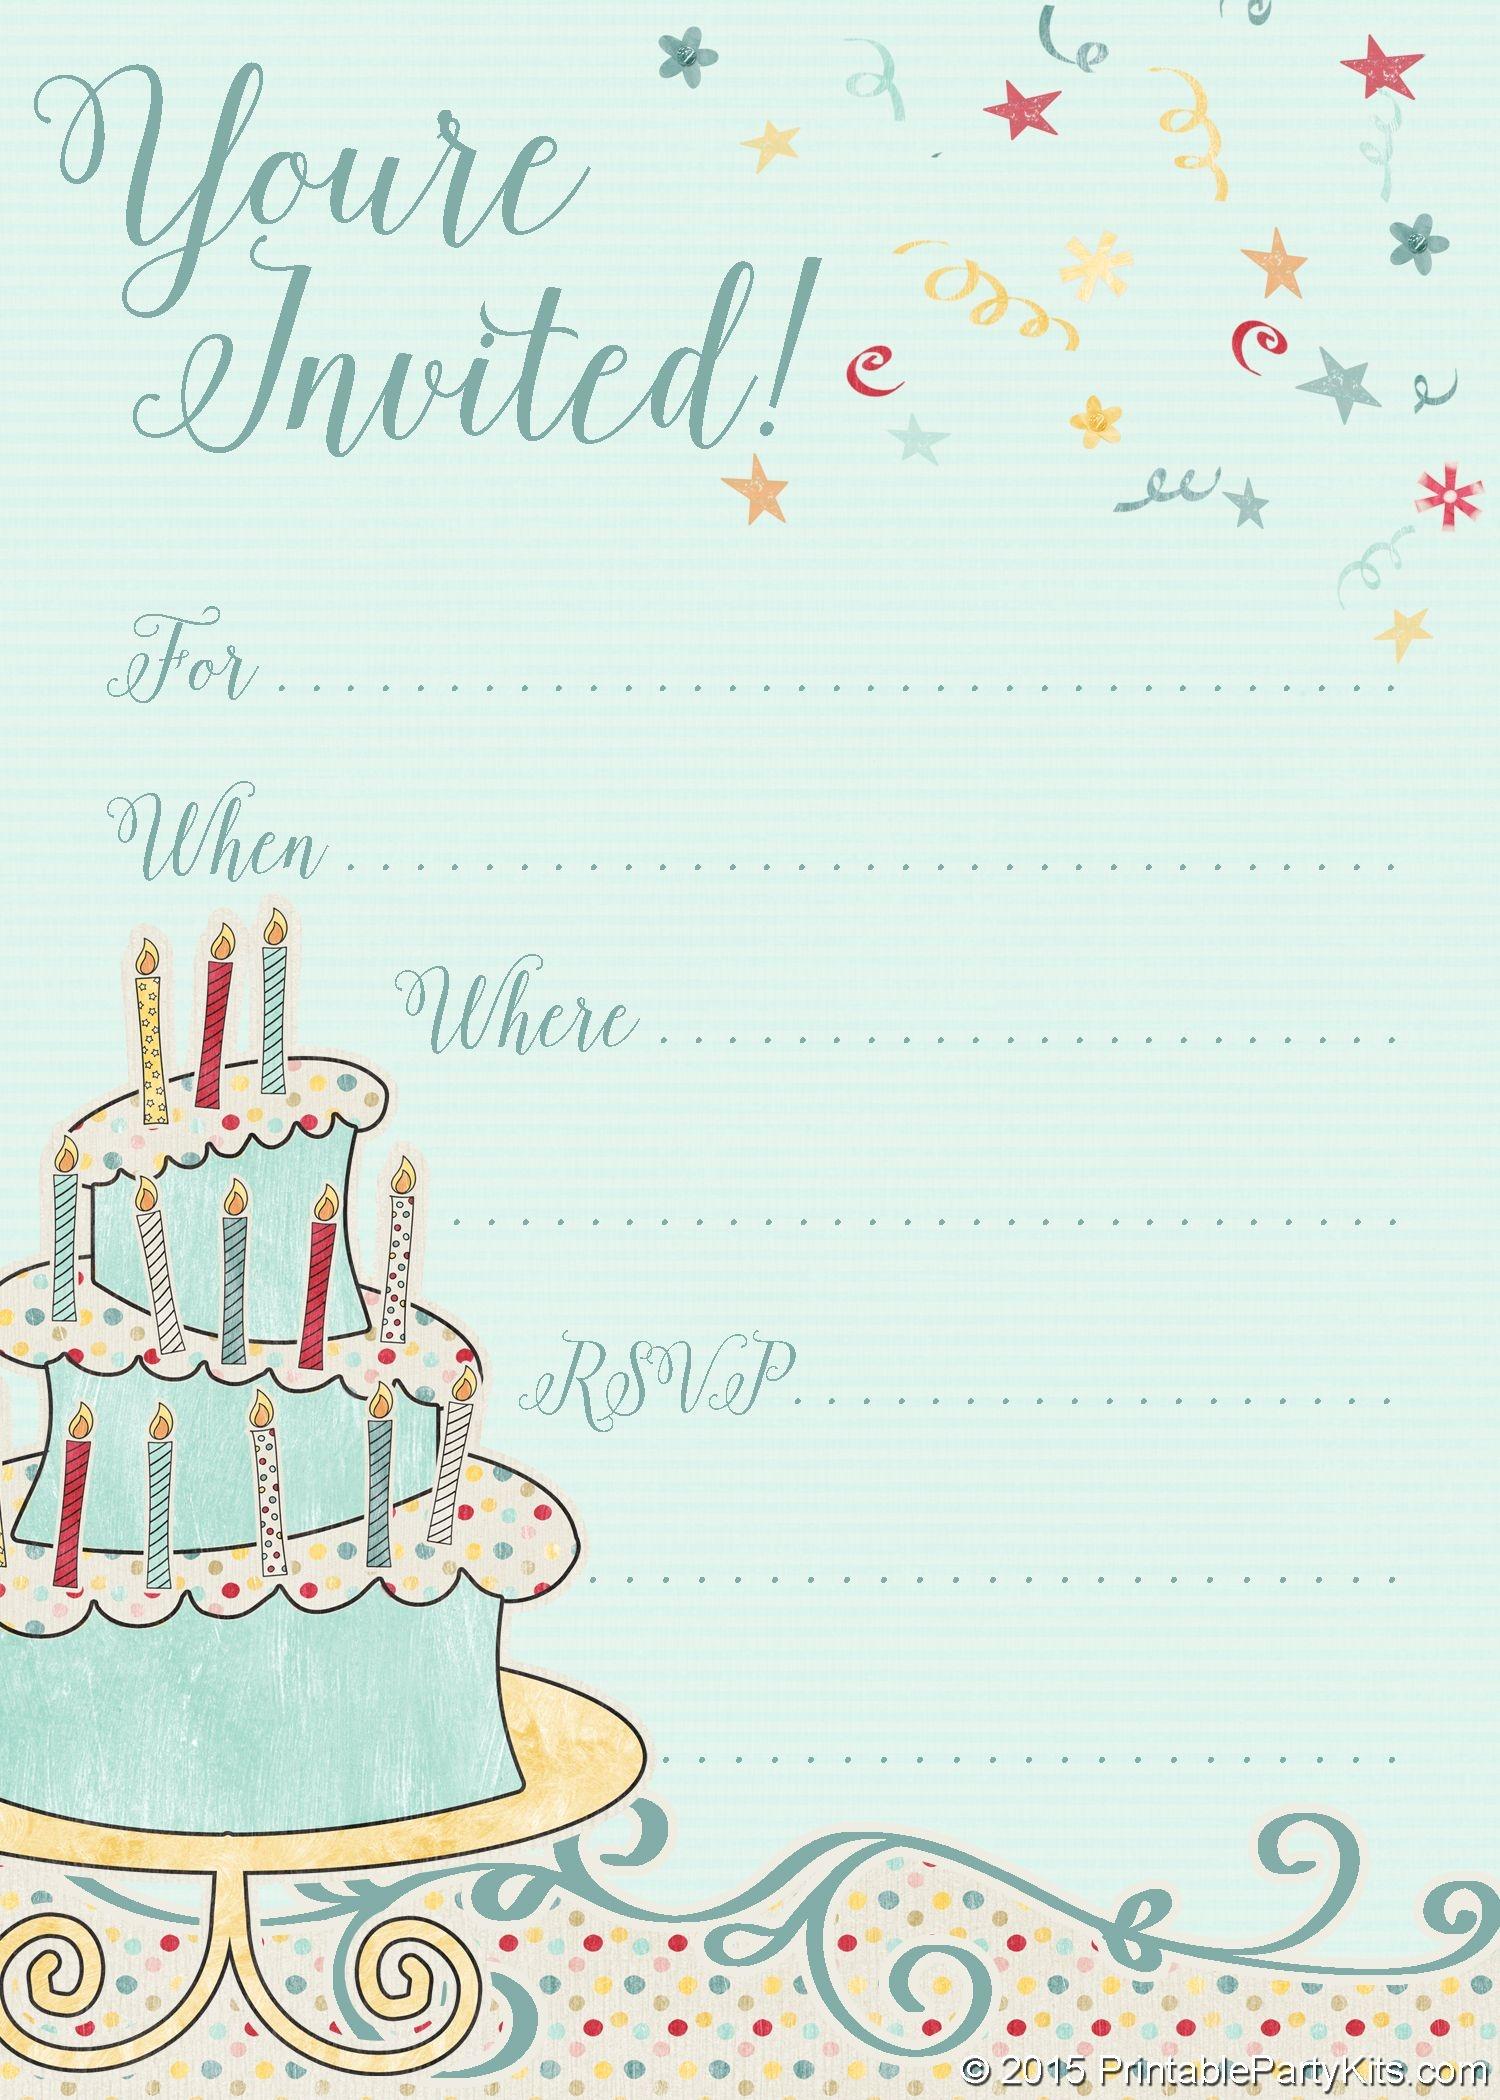 Free Printable Whimsical Birthday Party Invitation Template   Party - Invitations Templates Online Free Printable